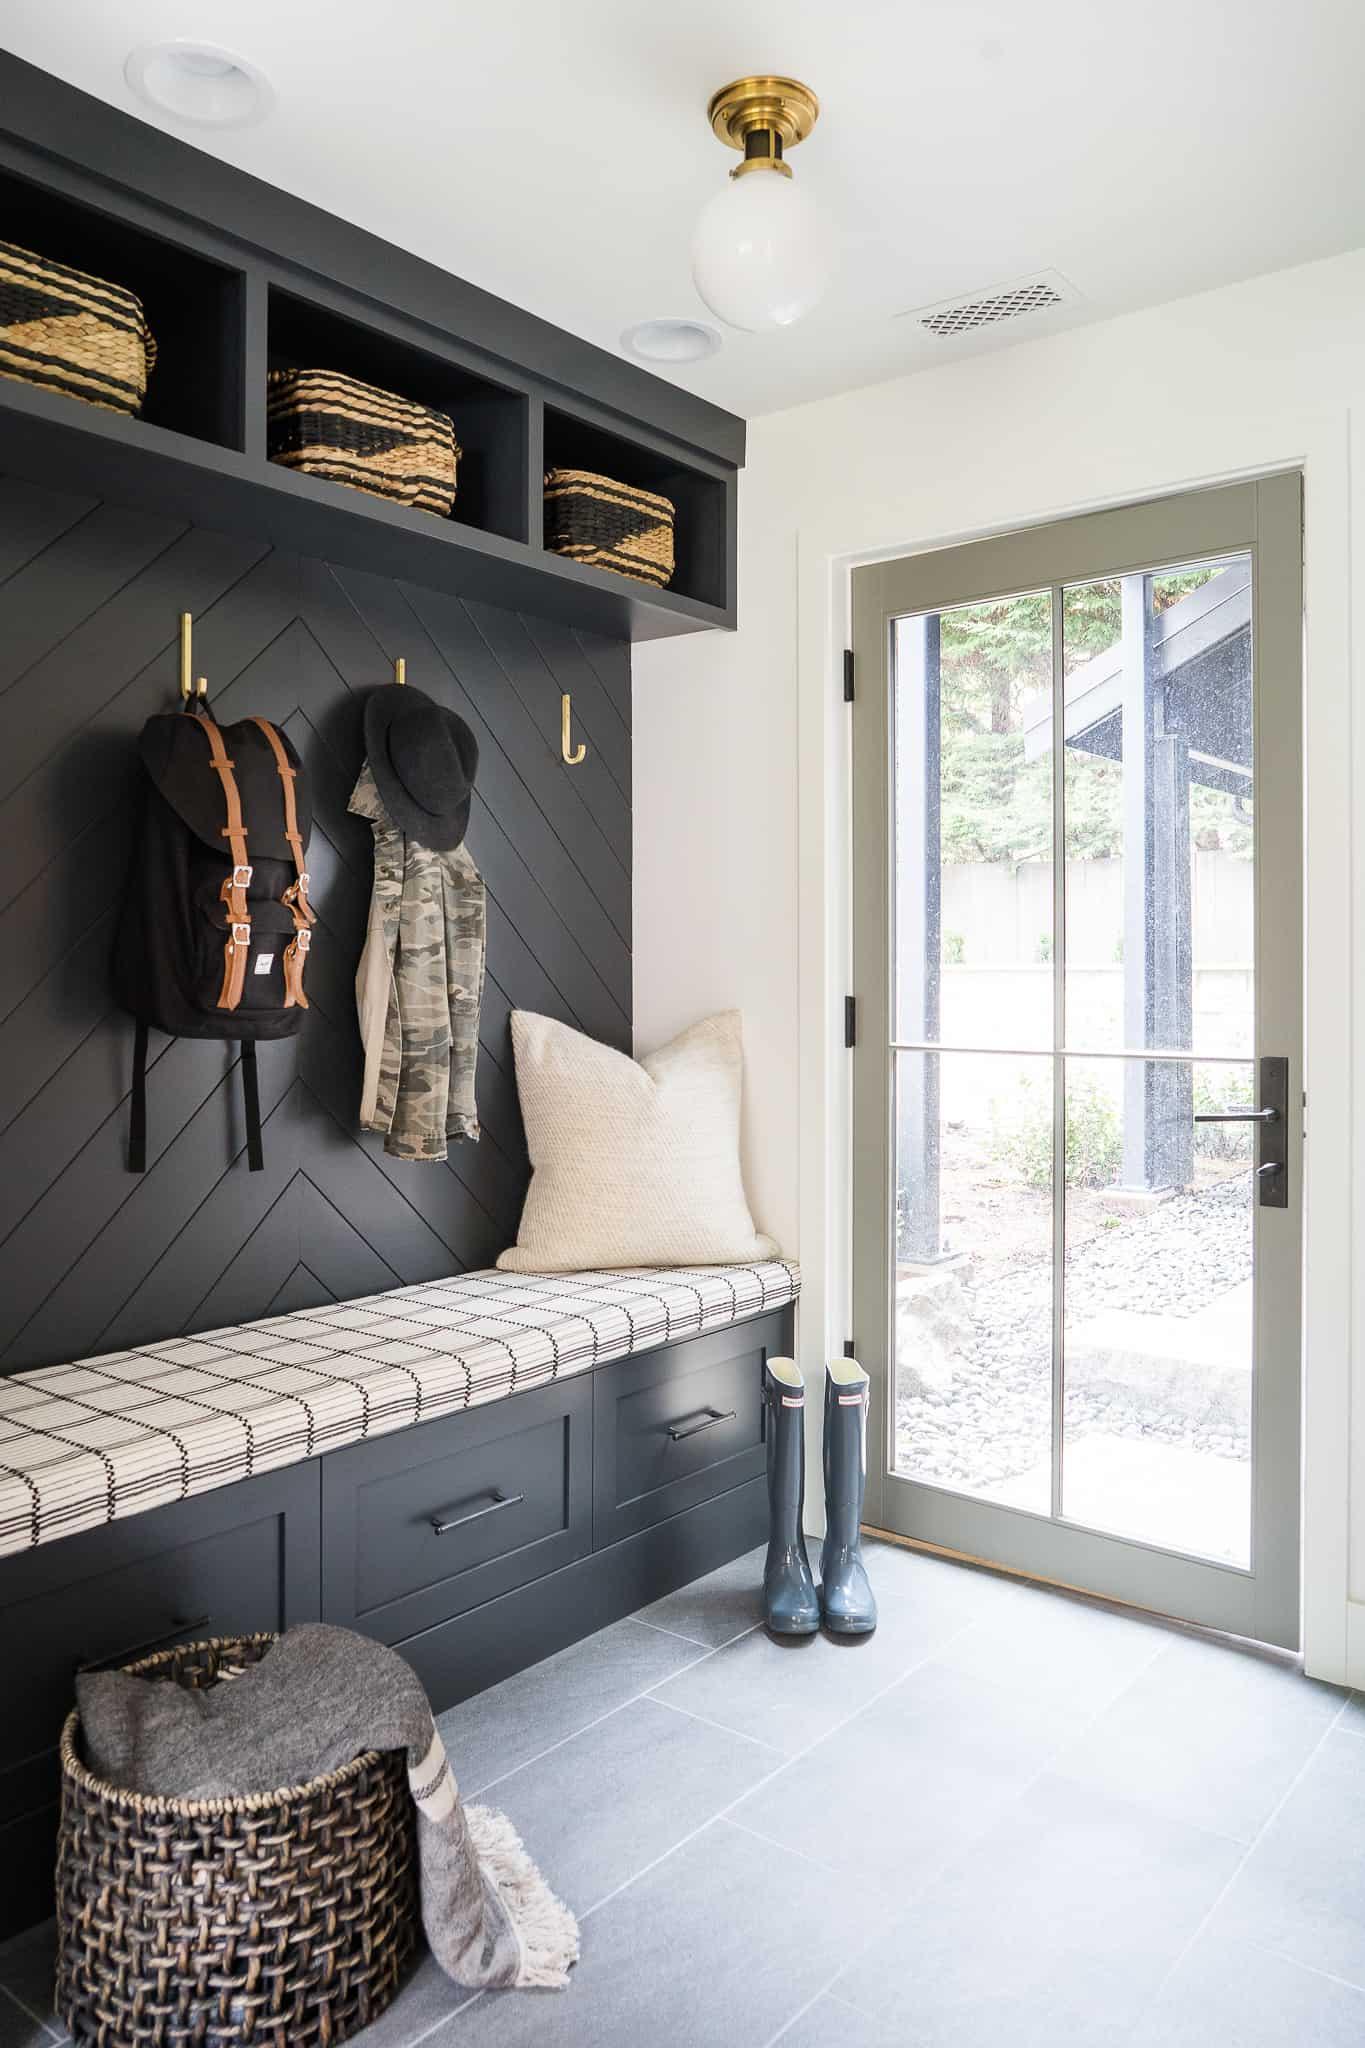 Black and White Mudroom Design: Bainbridge Project - Mindy Gayer Design Co.